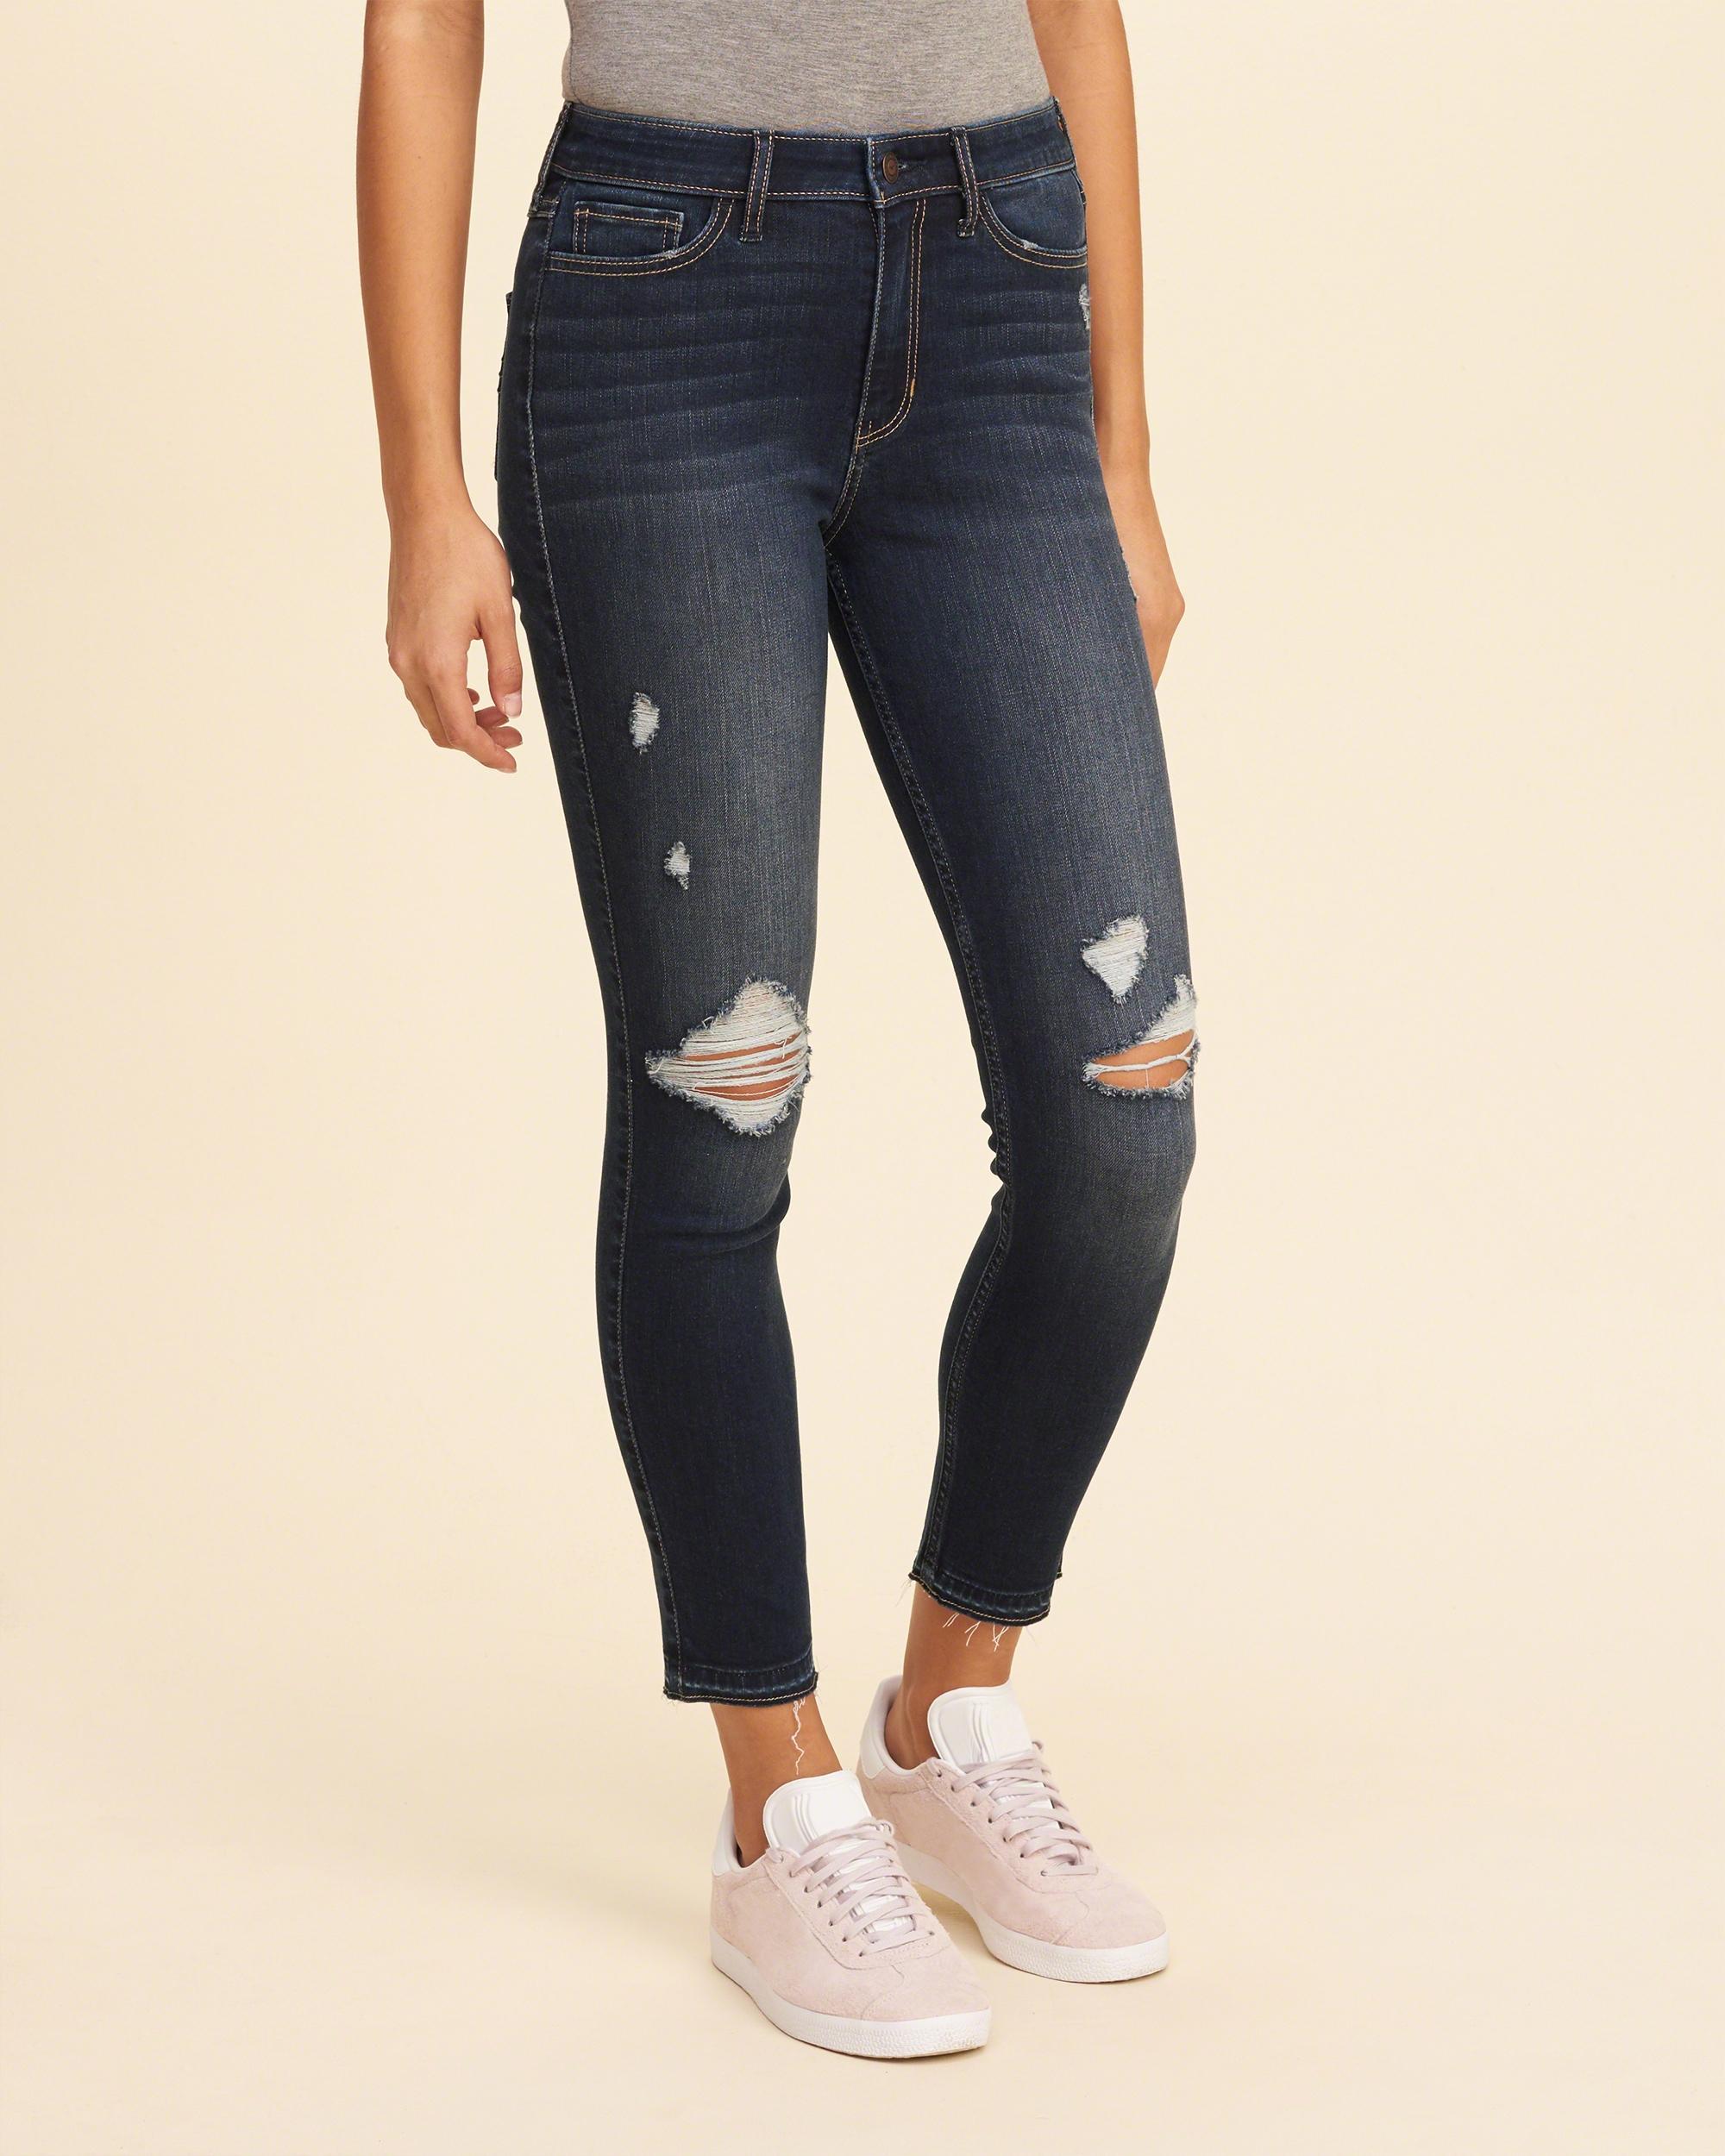 Lyst - Hollister High-rise Crop Super Skinny Jeans in Blue